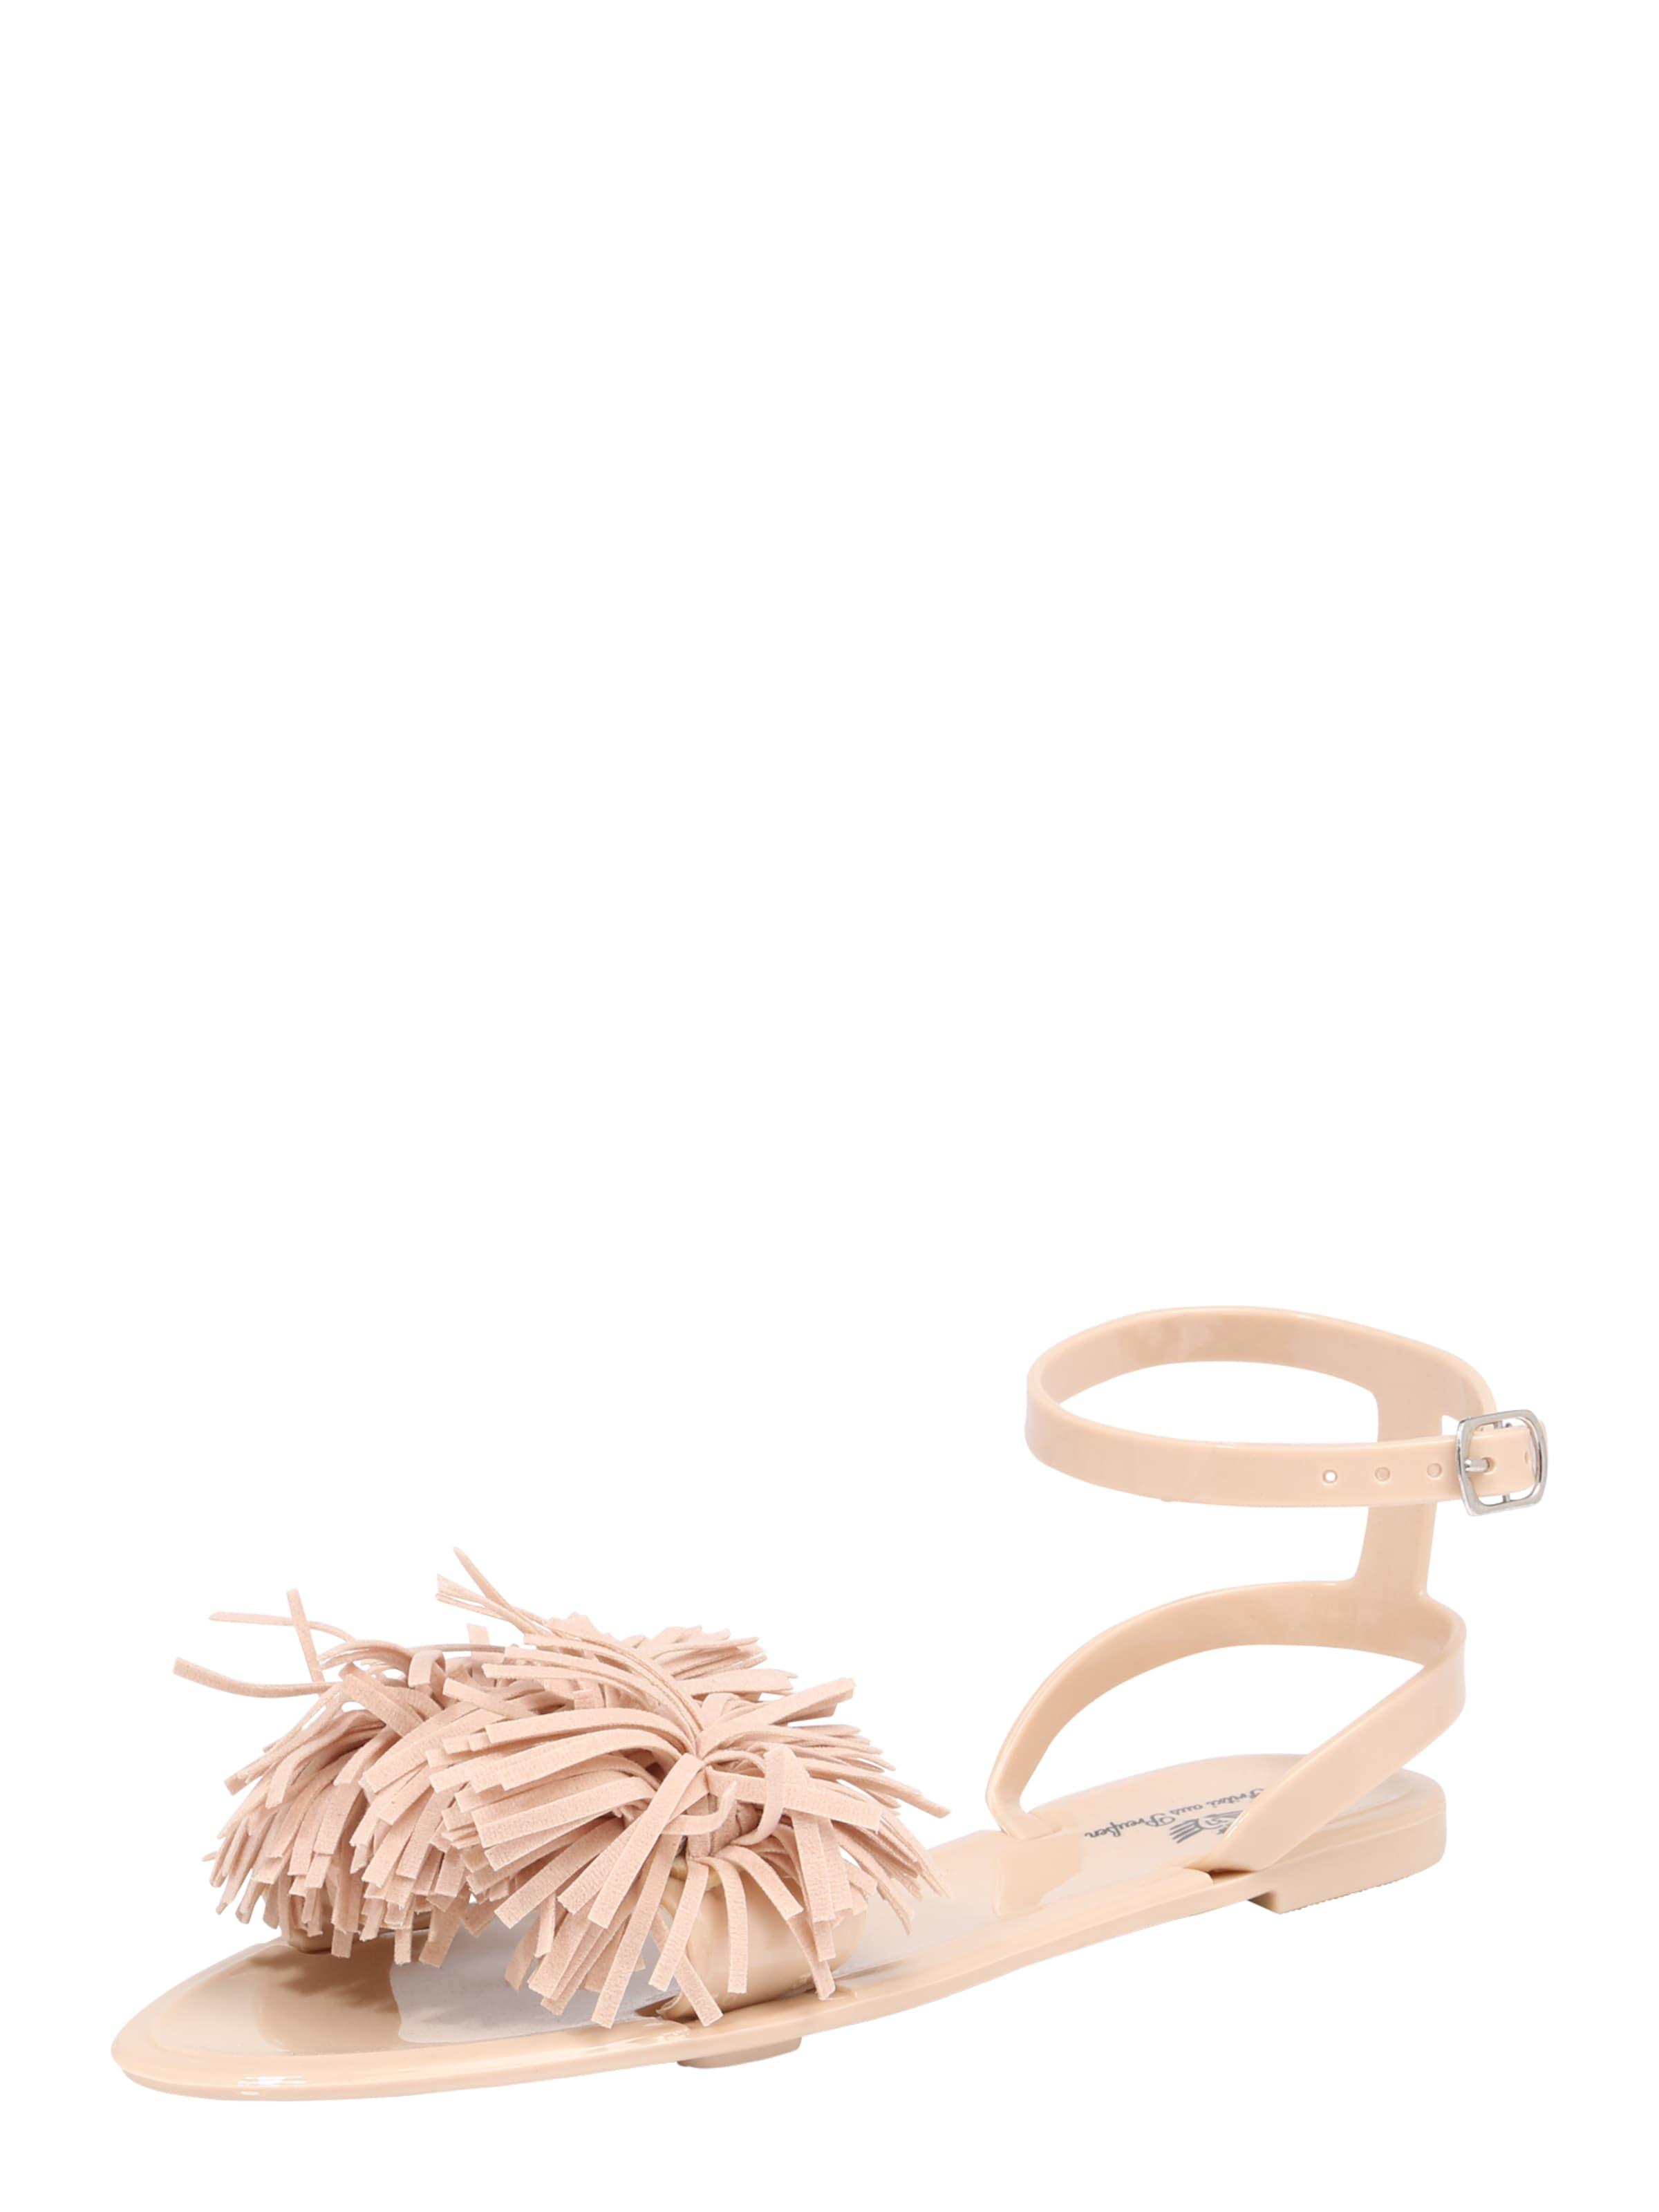 Fritzi aus Preußen »NYLA« Sandale, Fransen, natur, nude